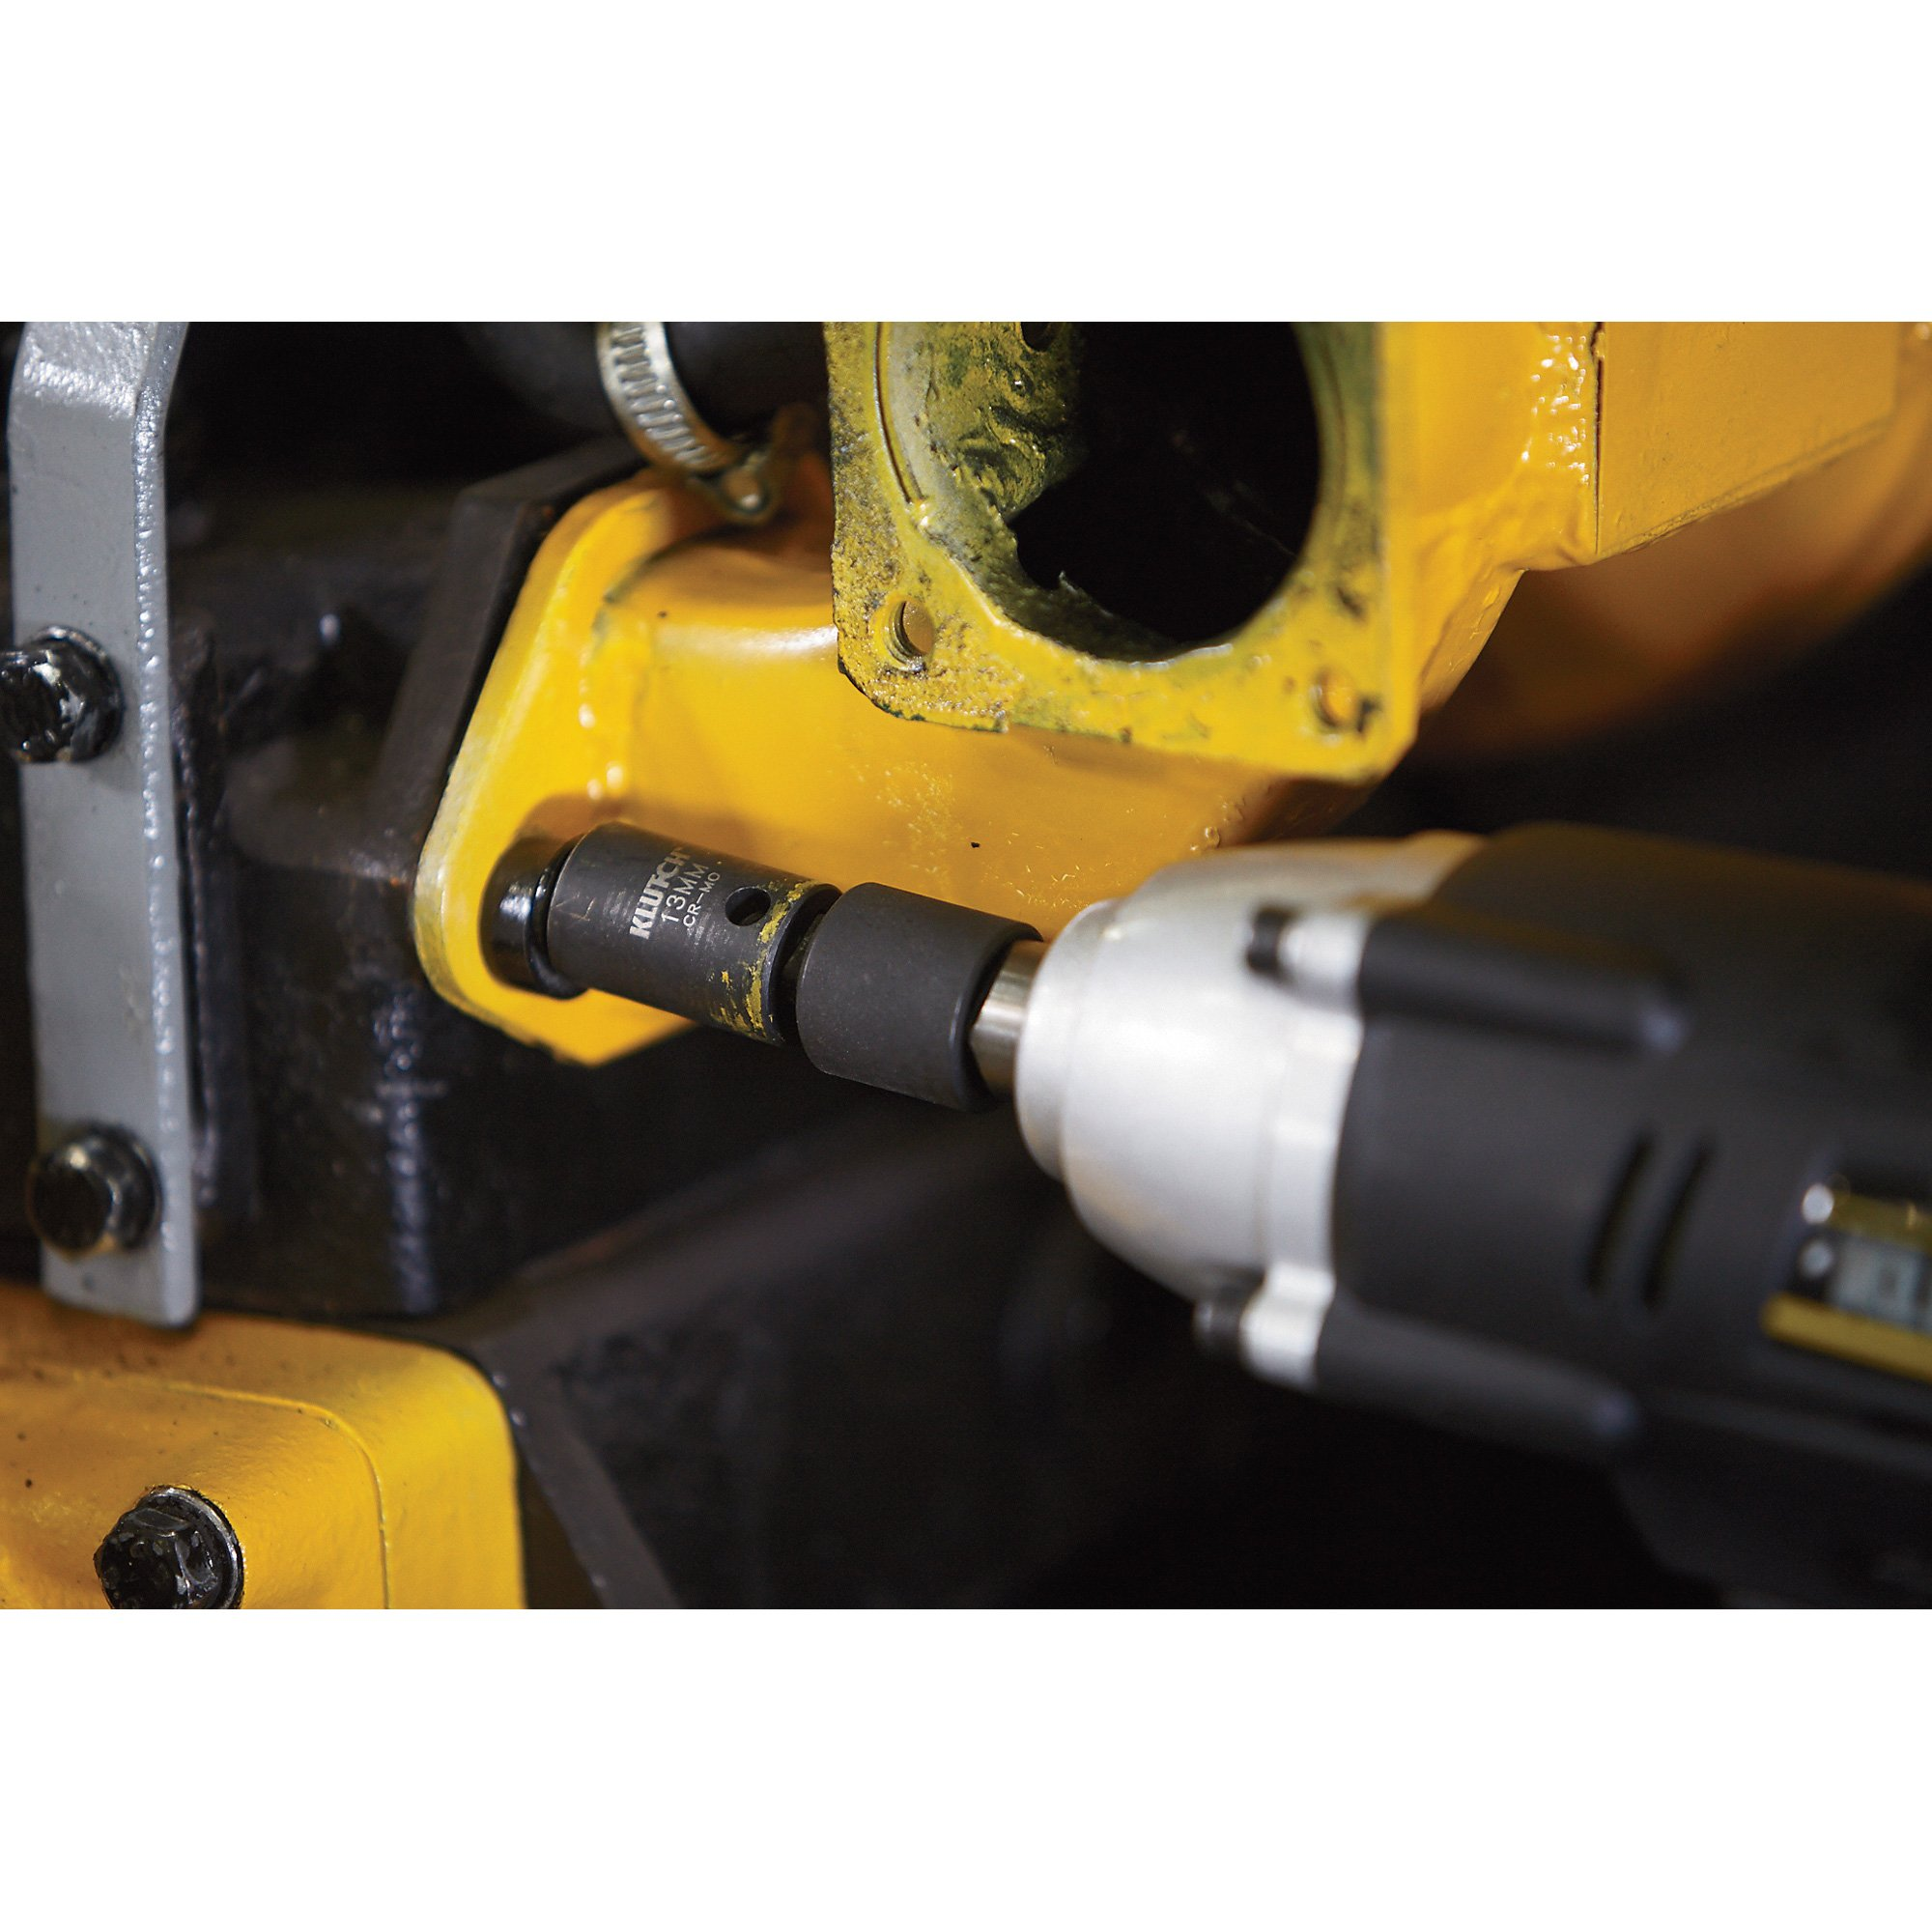 Ironton Impact Adapters - 8-Pc. Set by Ironton (Image #1)